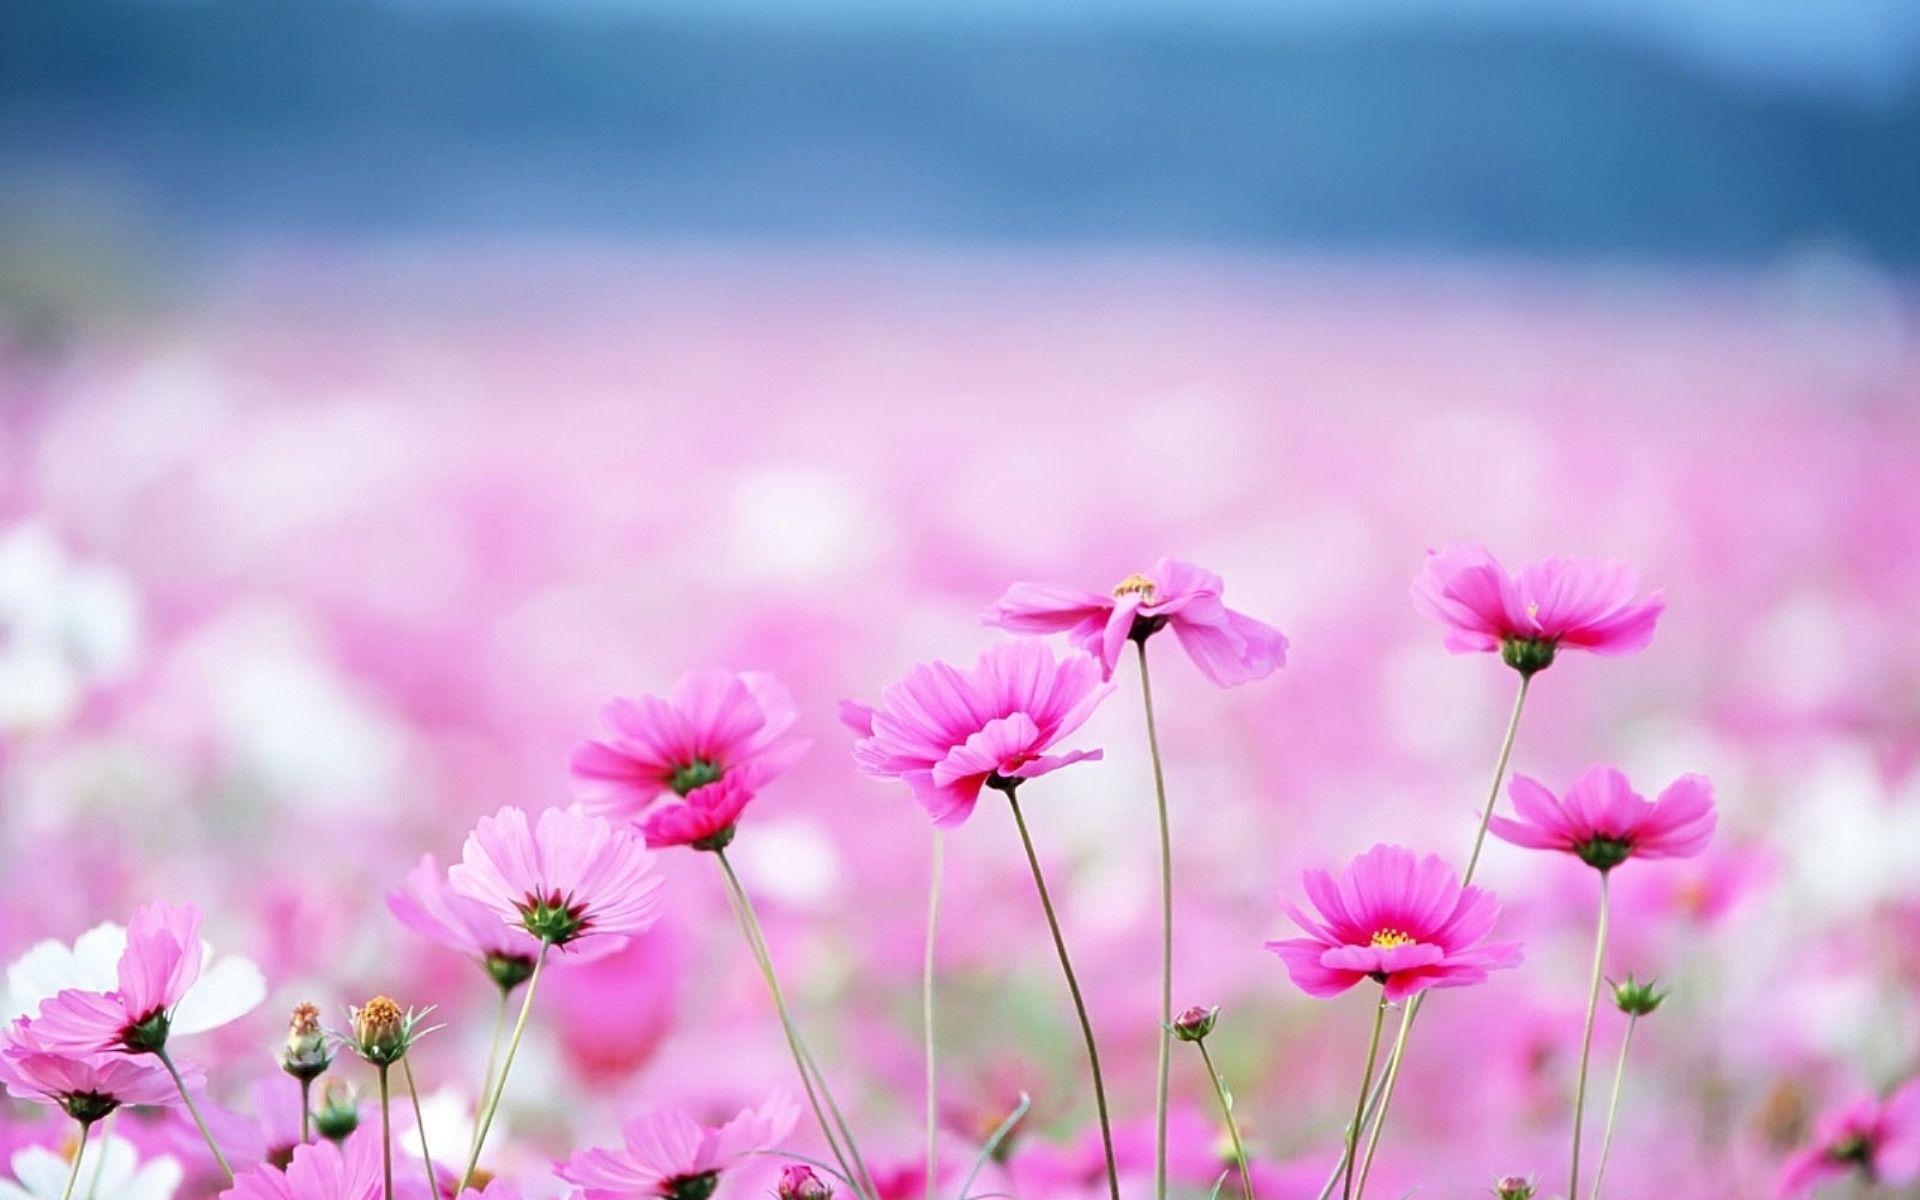 Floral Desktop Background Wallpapers HD